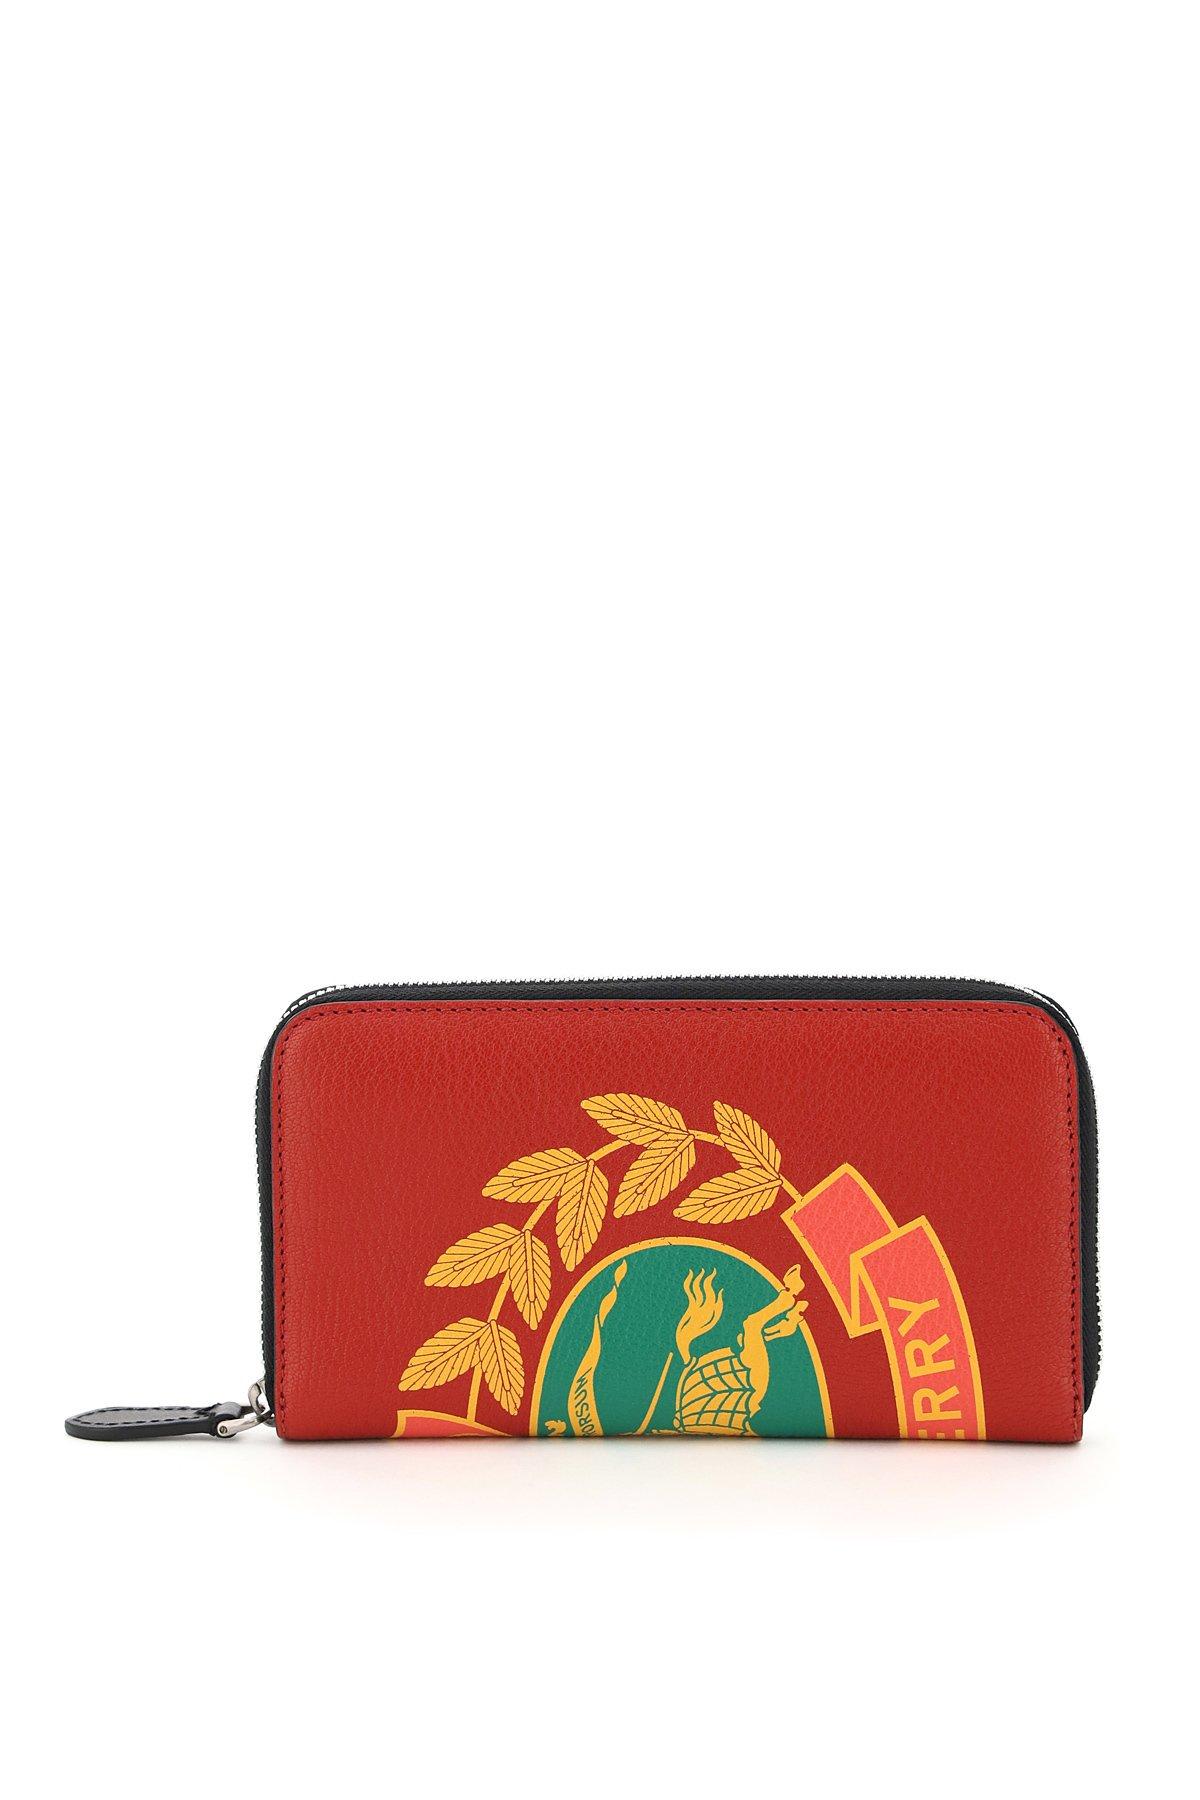 Burberry portafoglio zip around stemma d'archivio